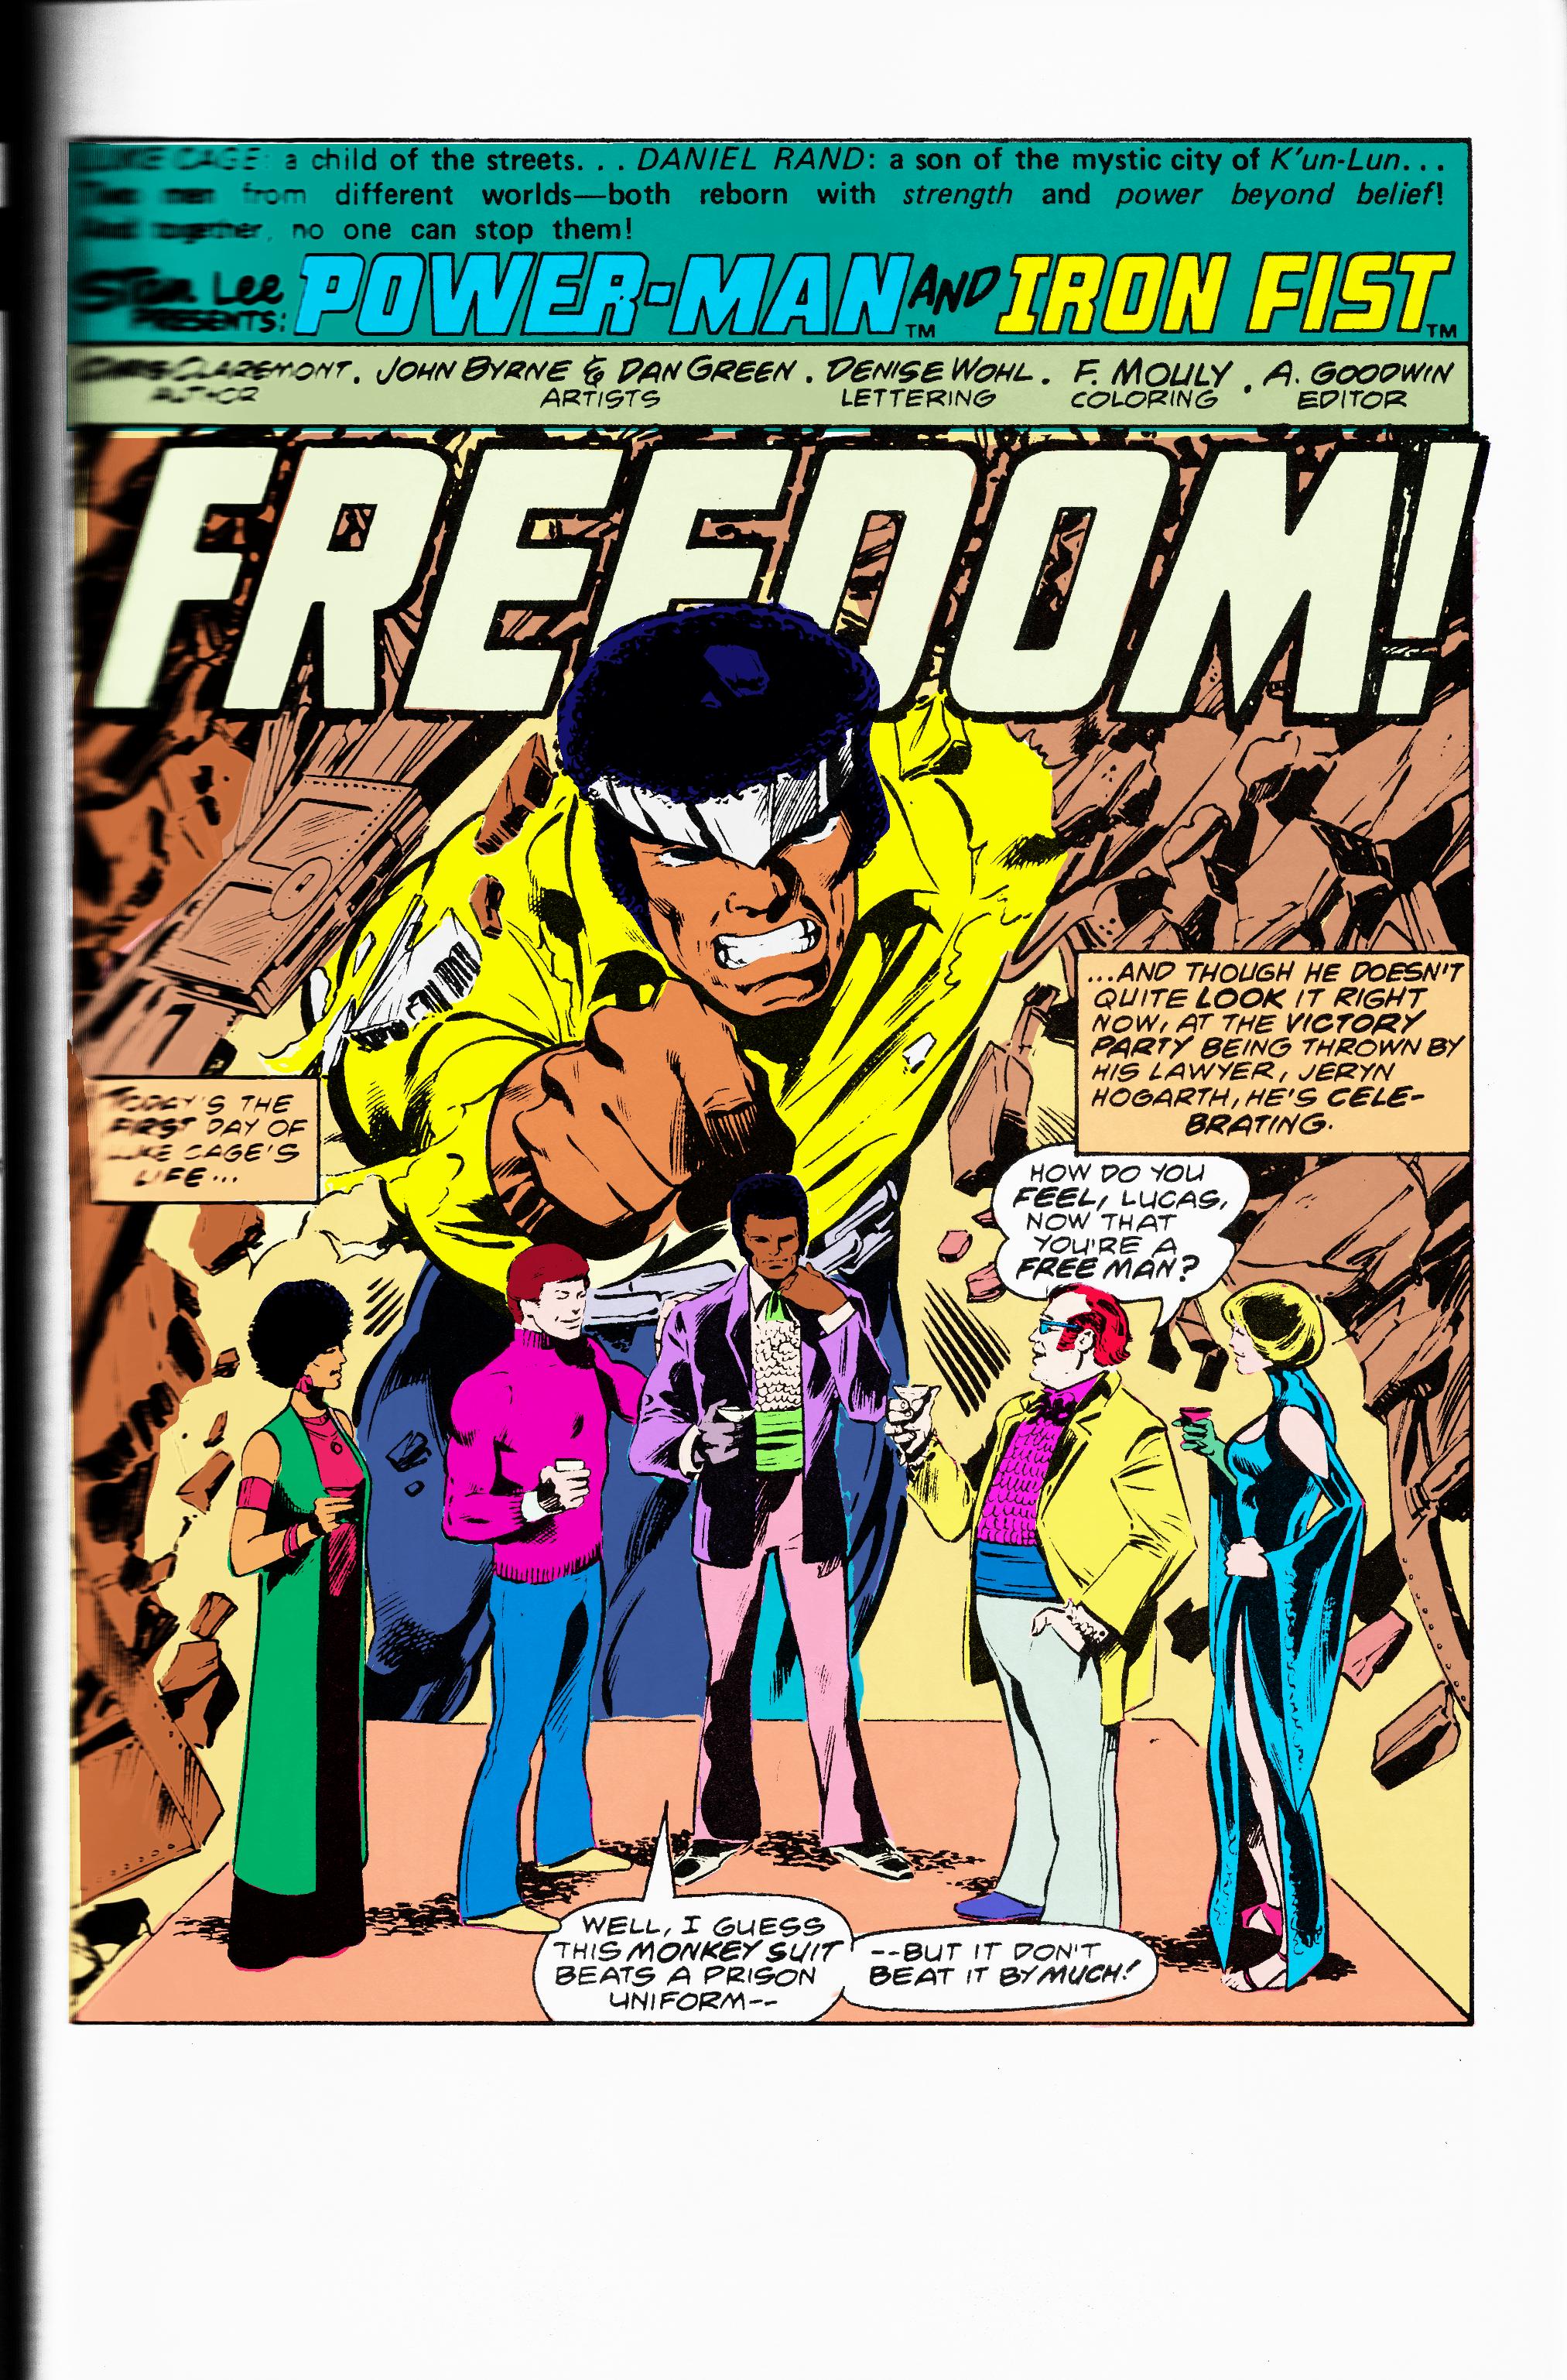 Powerman and iron fist 50